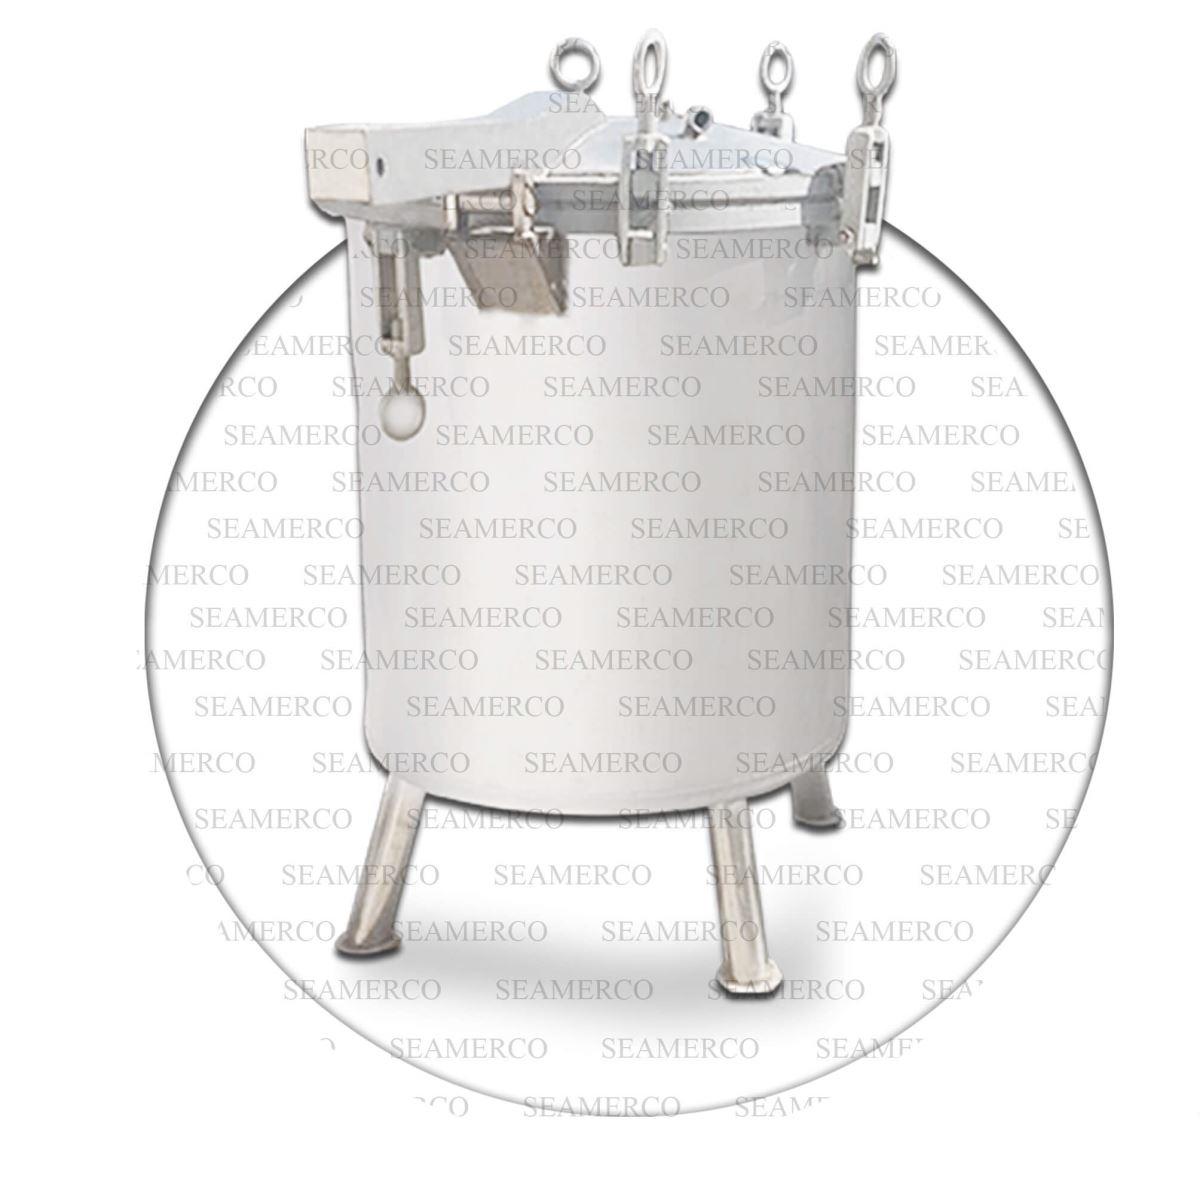 اتوکلاو صنعتی چیست-خرید دستگاه اتوکلاو-انواع اتوکلاو-روش کار با دستگاه اتوکلاو